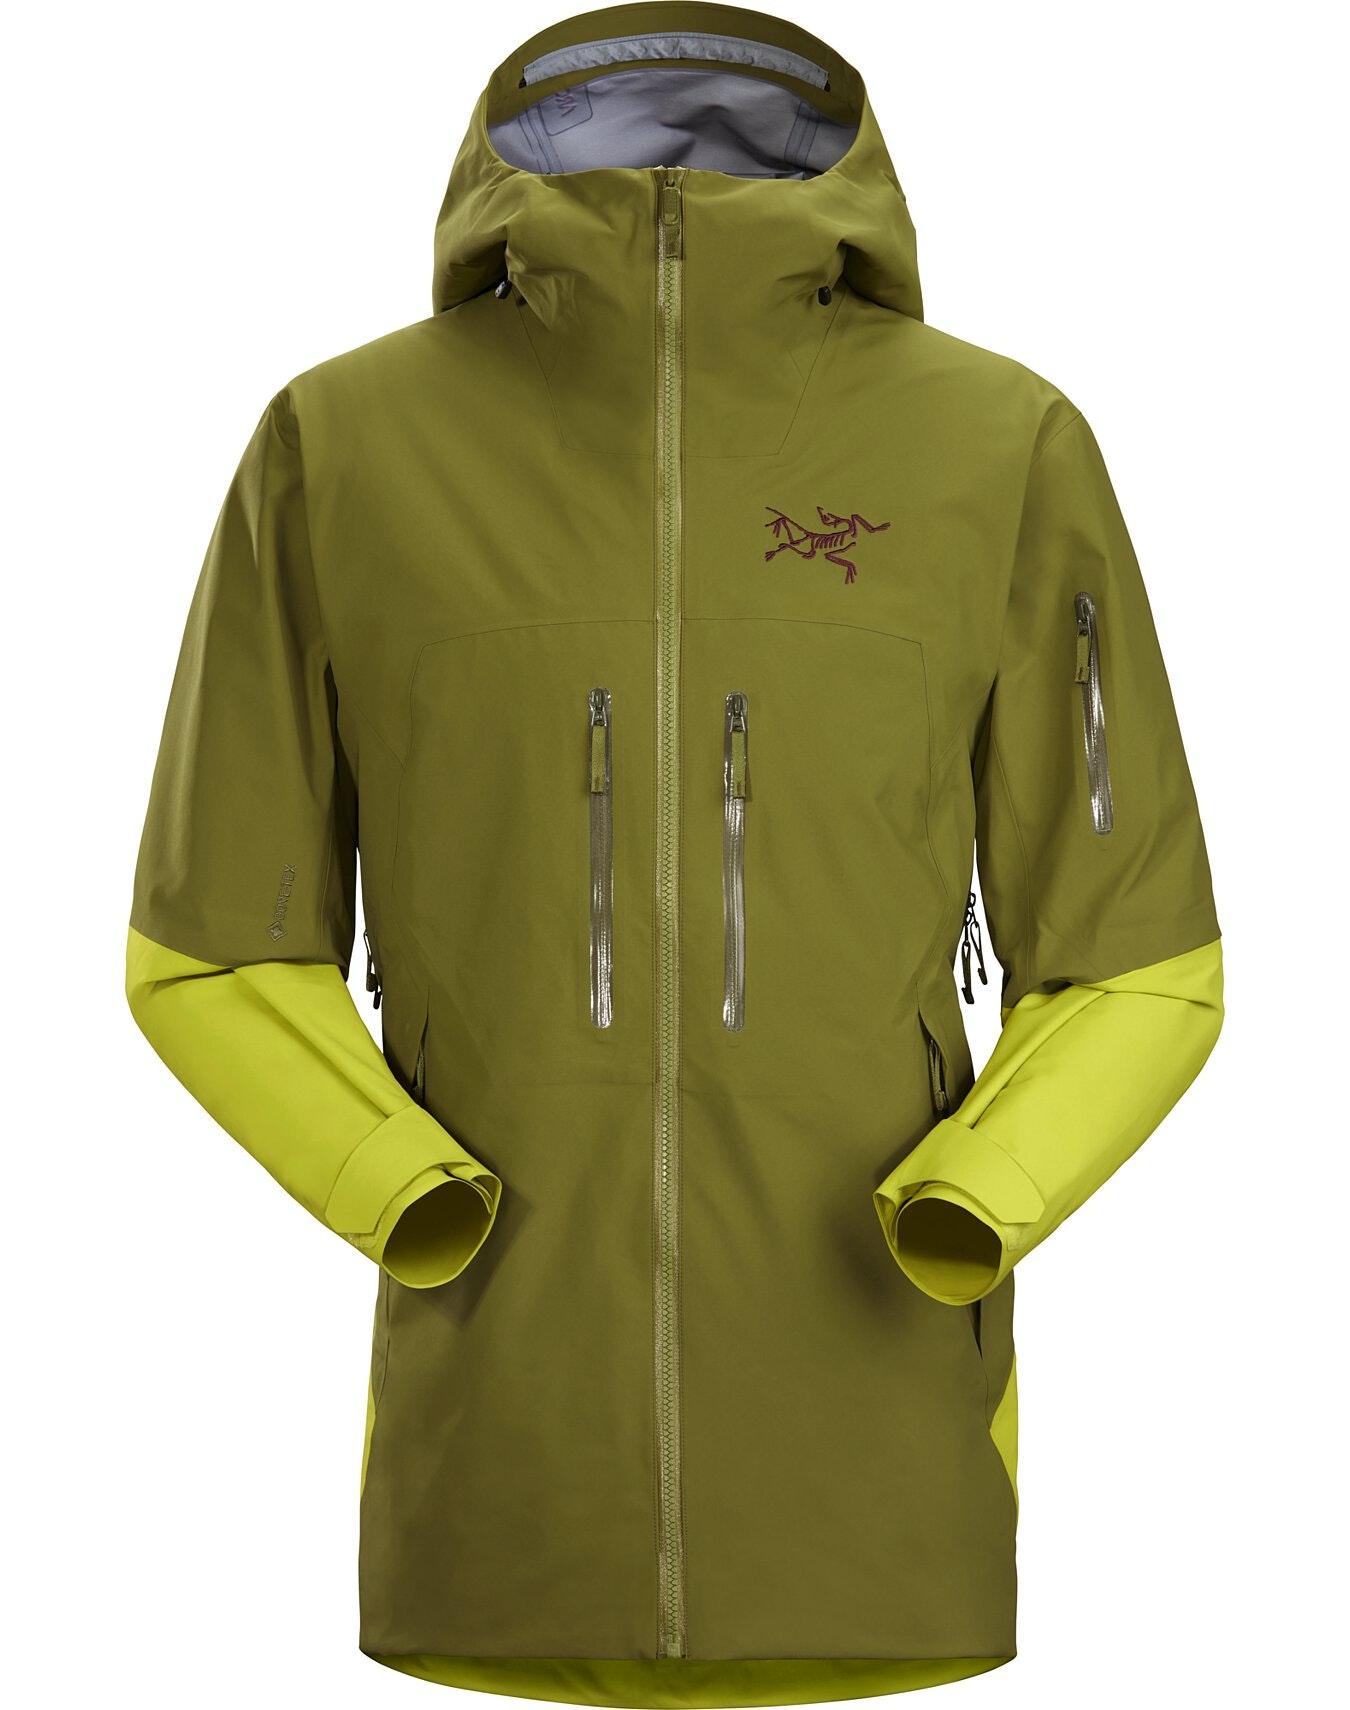 Sabre LT Jacket Gnarnia Glades